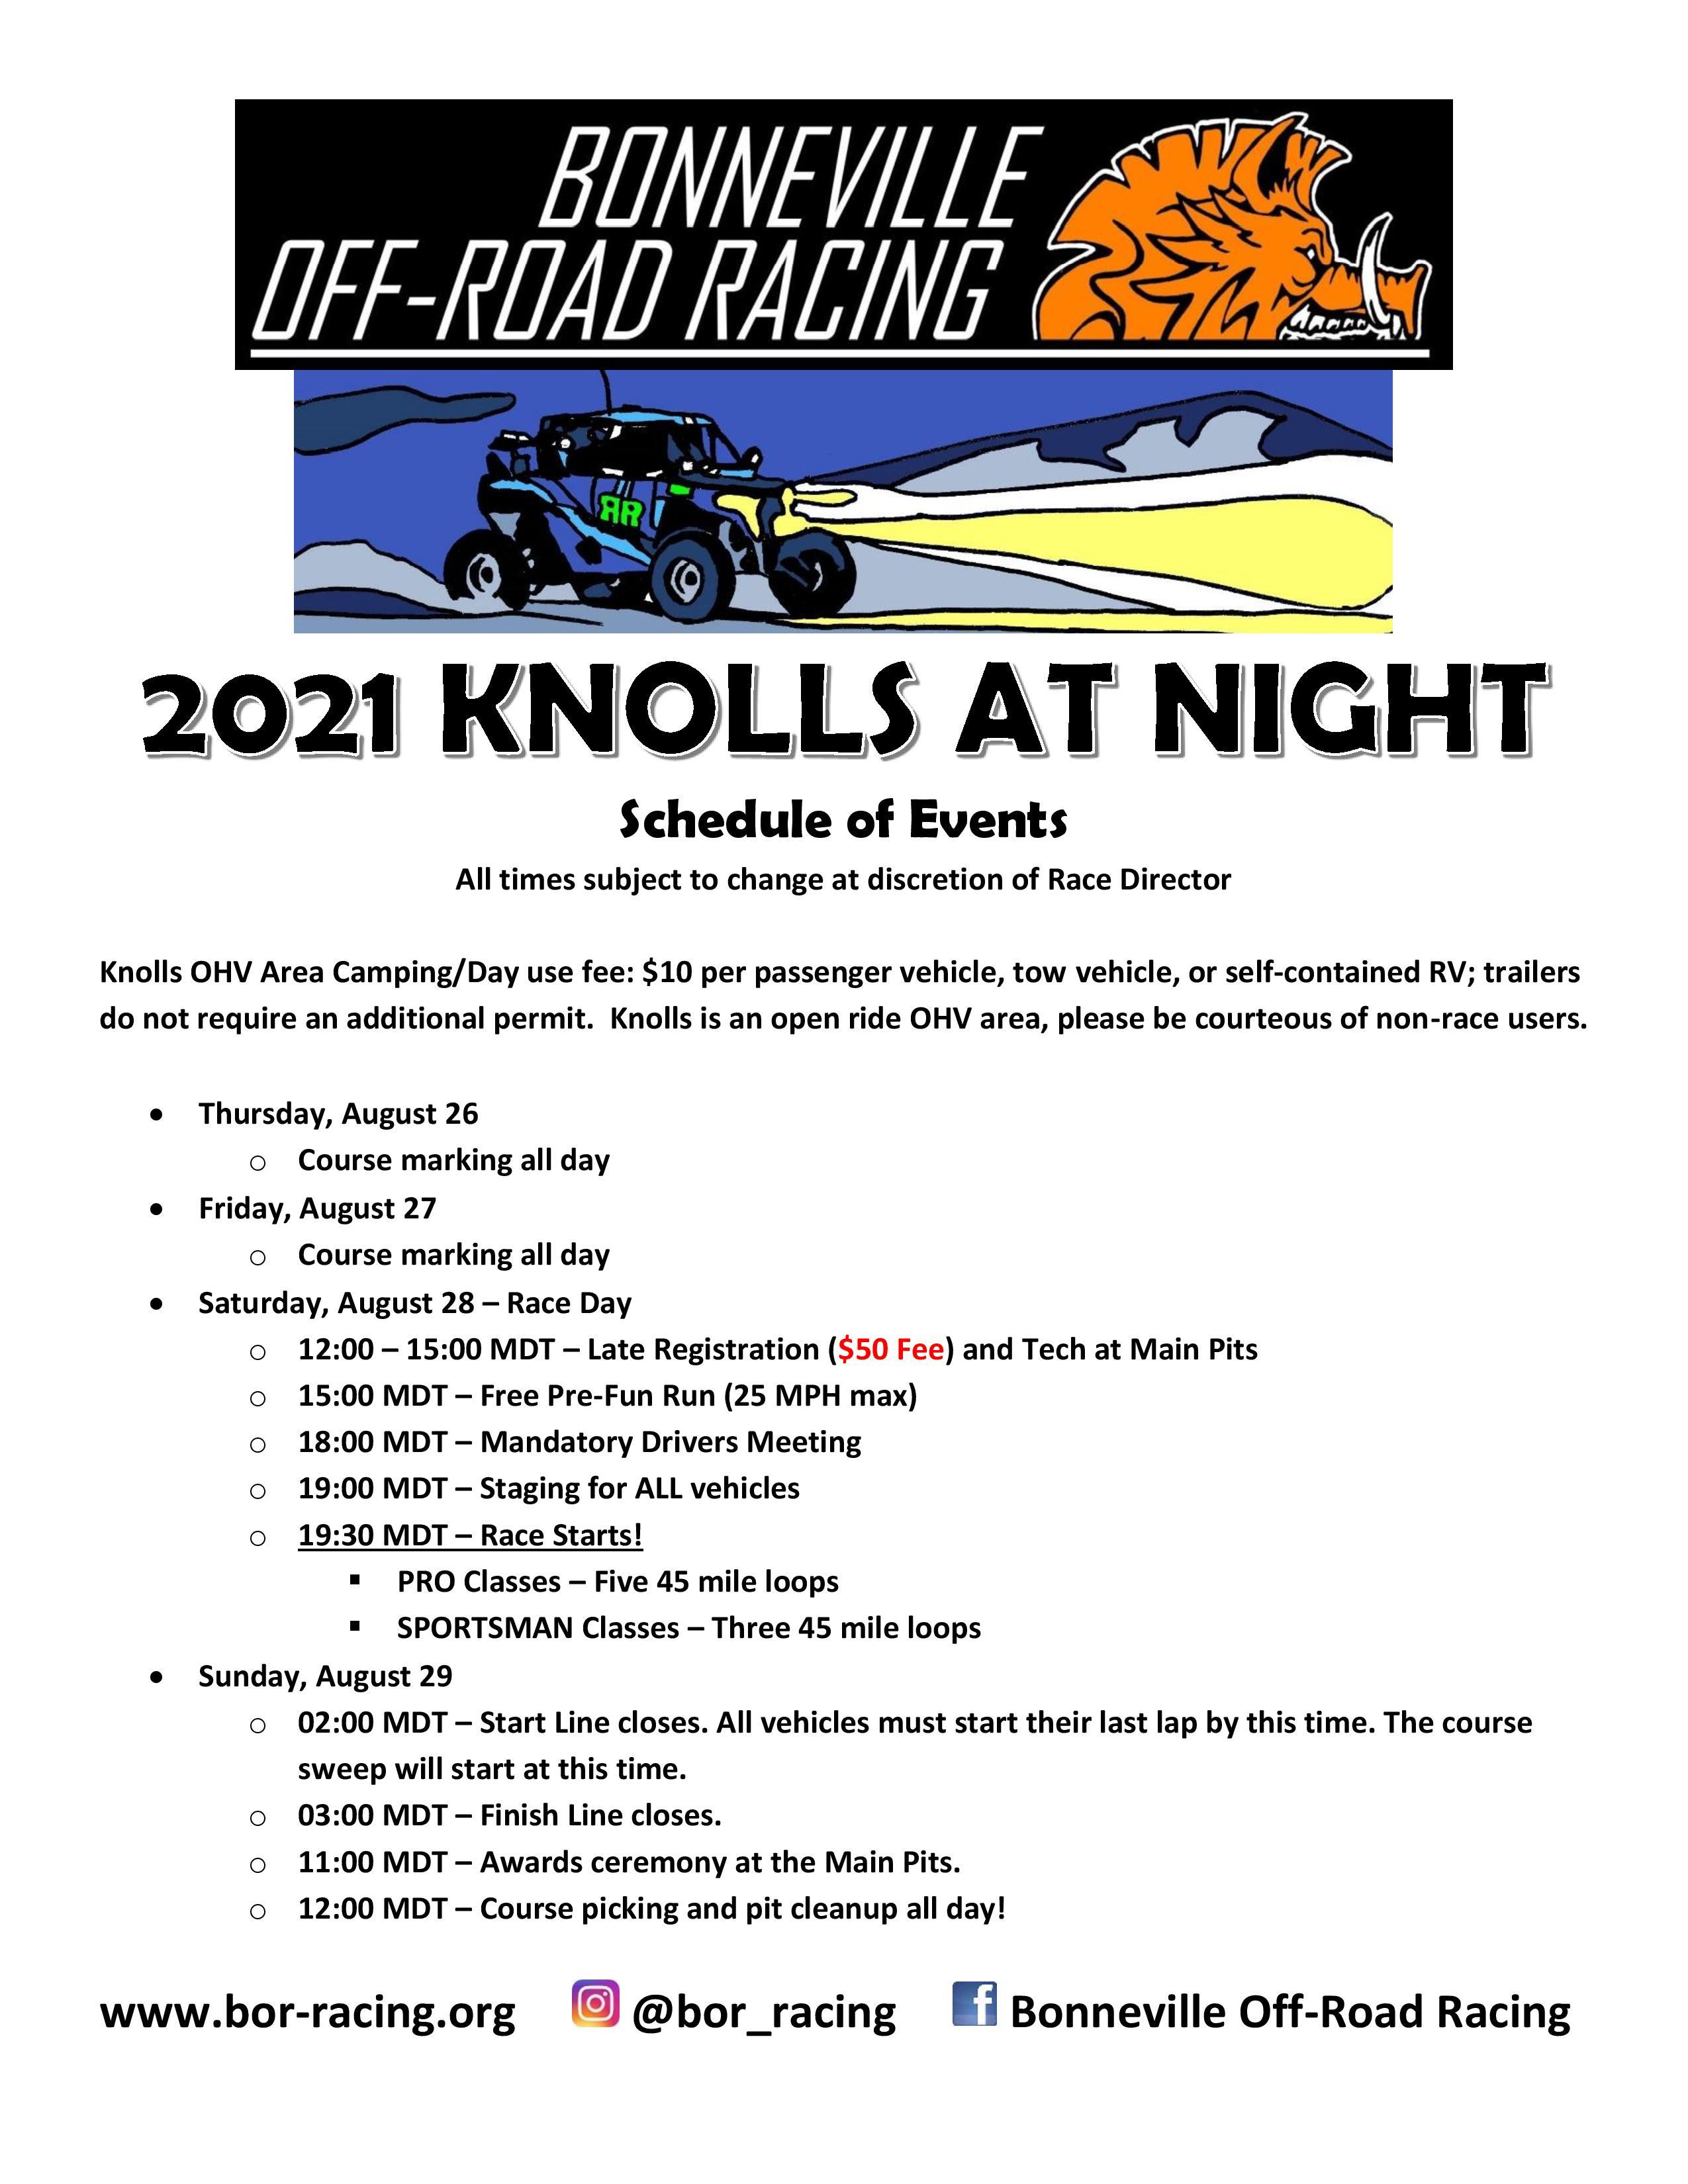 2021 Knolls at Night Schedule.jpg